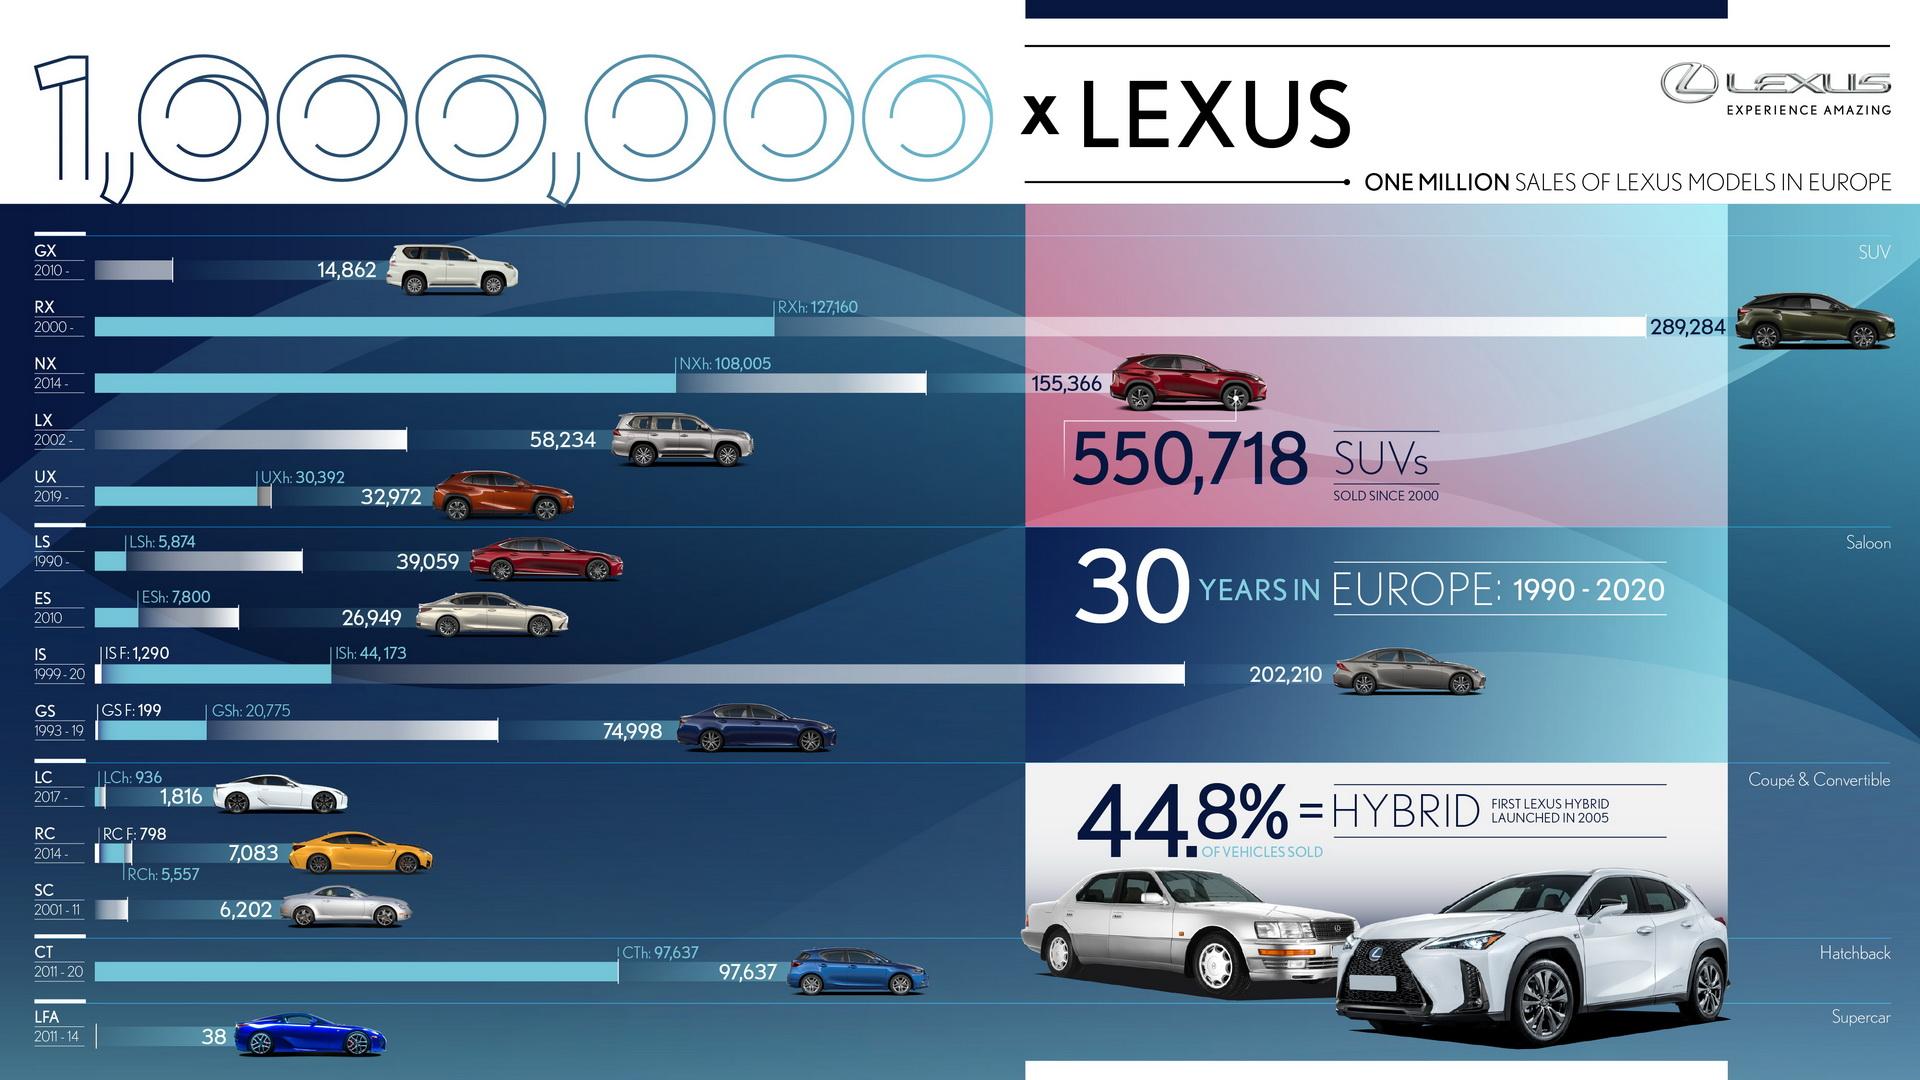 lexus-1-million-sales-europe-2020-1.jpg